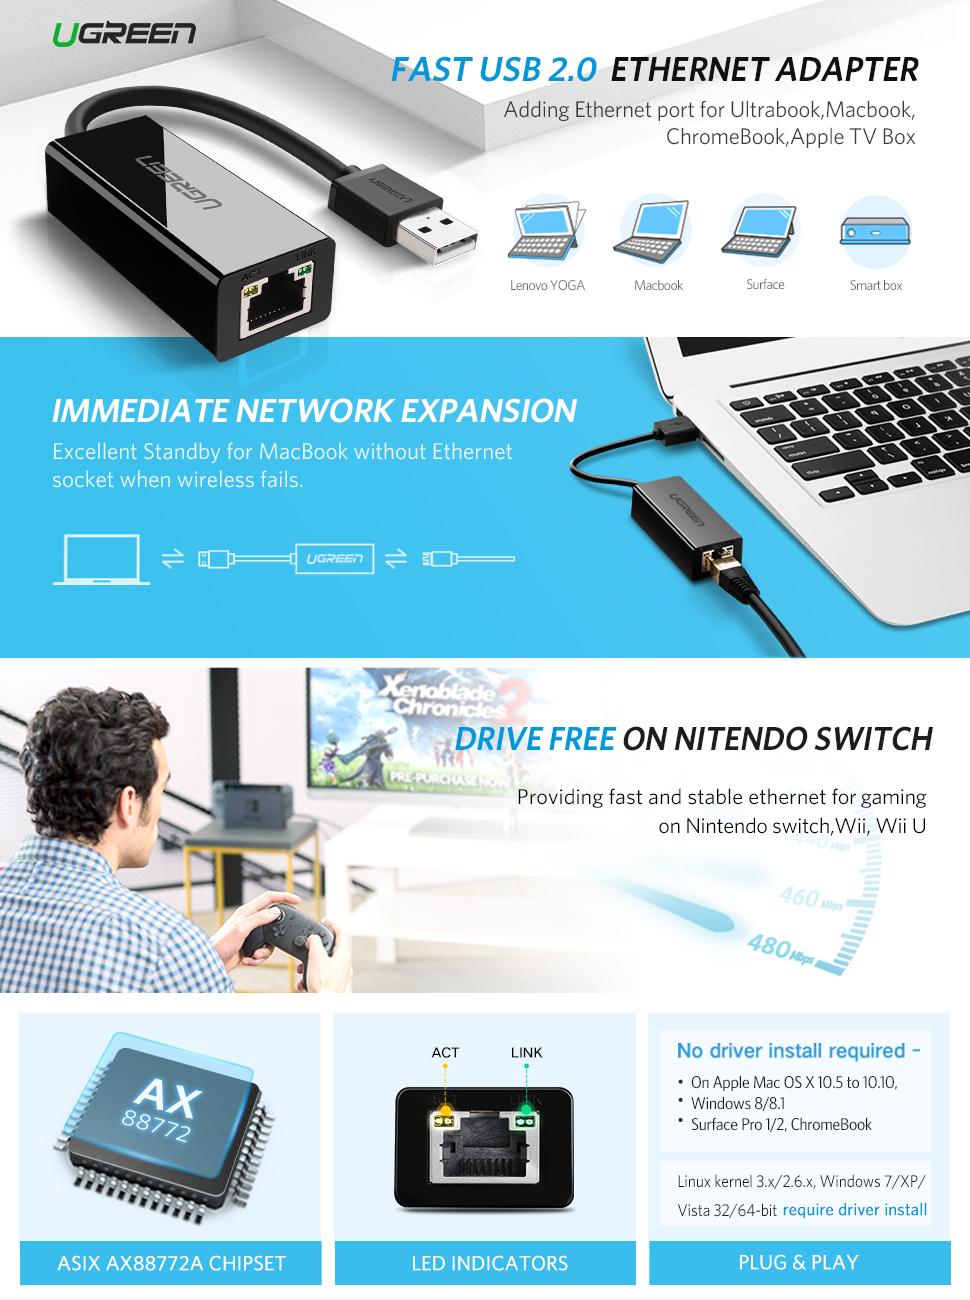 Amazon.com: UGREEN Ethernet Adapter USB 2.0 to 10/100 Network RJ45 ...